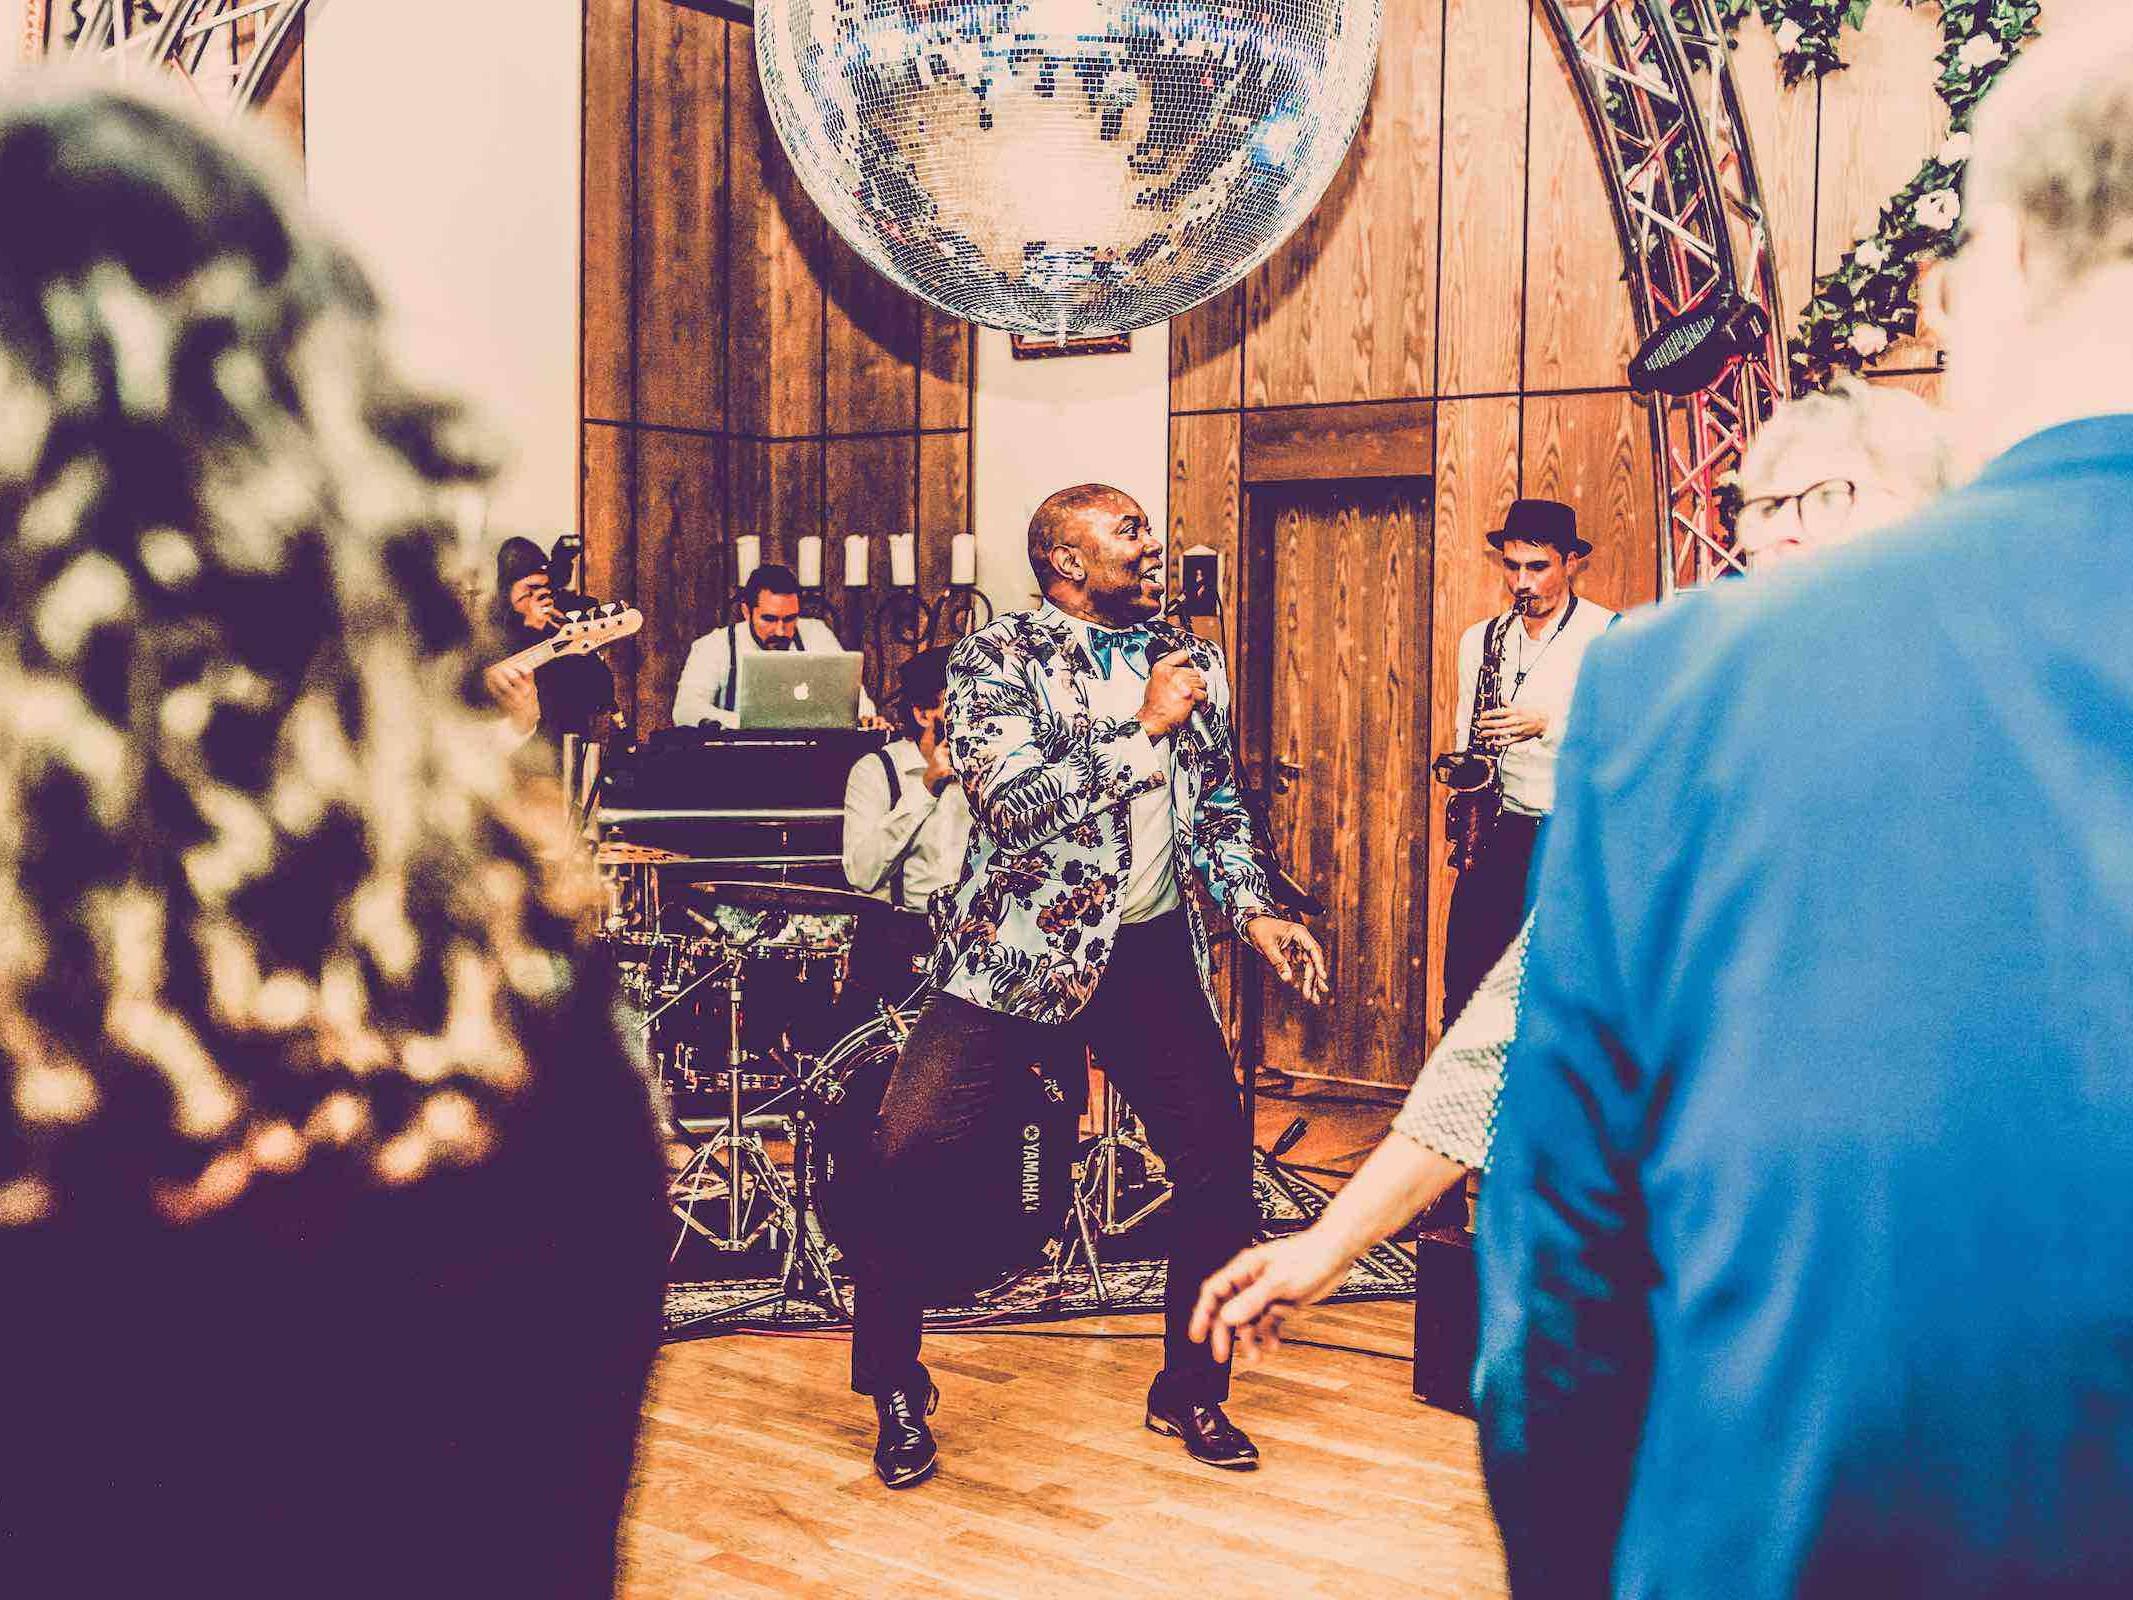 Band   Hamburg   Liveband   Partyband   Jazzband   Swingband   Lounge   Pop   Jazz   Sänger   Frontsänger   Johnny Tune   Hochzeit   Standesamt   Trauung   Firmenfeier   Charity   Gala   Buchen   Mieten   Anfragen   Hamburgfeiert